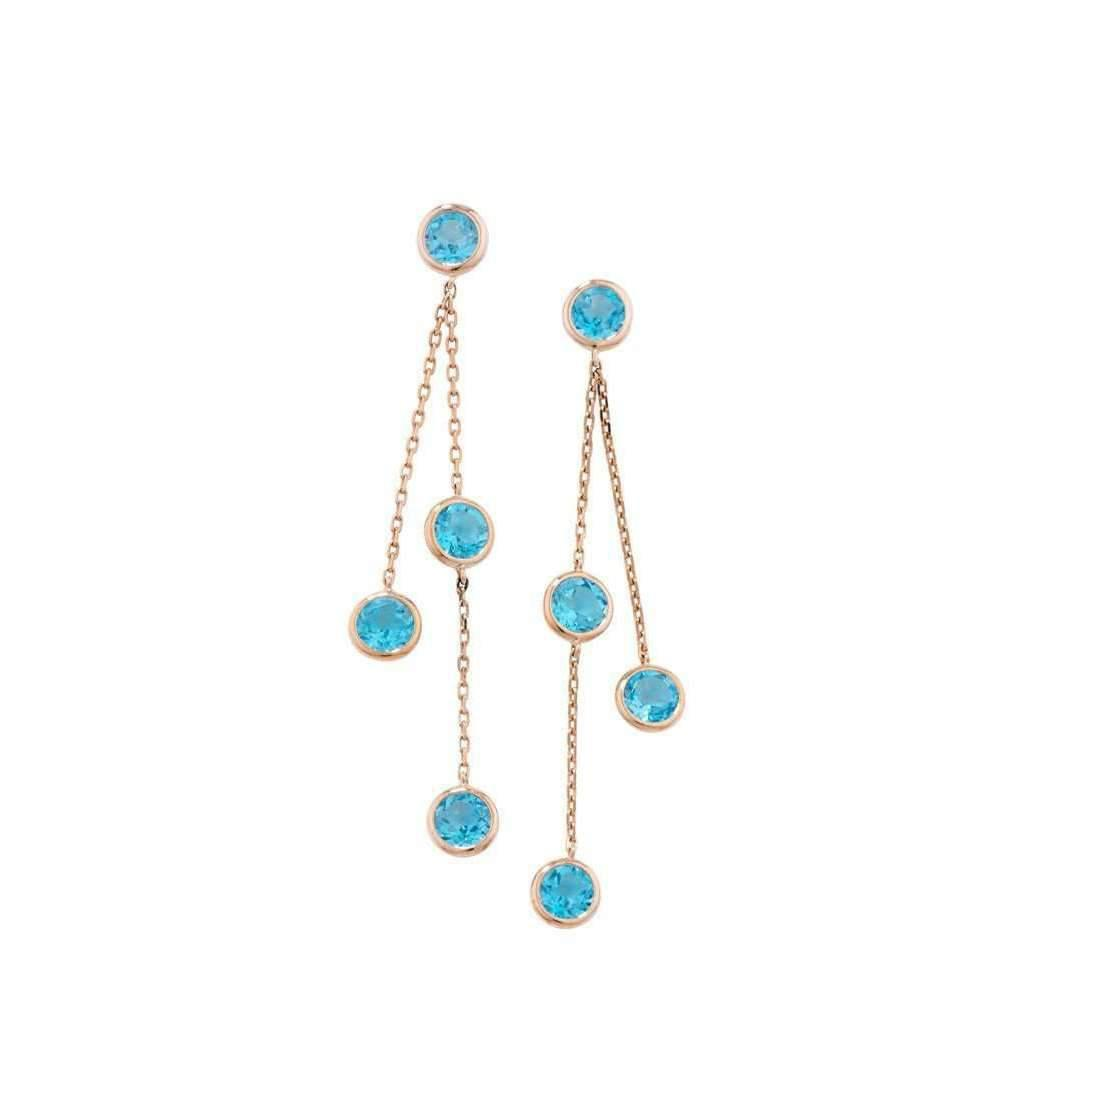 London Road Jewellery Pimlico Rose Gold Blue Topaz Drop Raindrop Necklace j5y6g8p